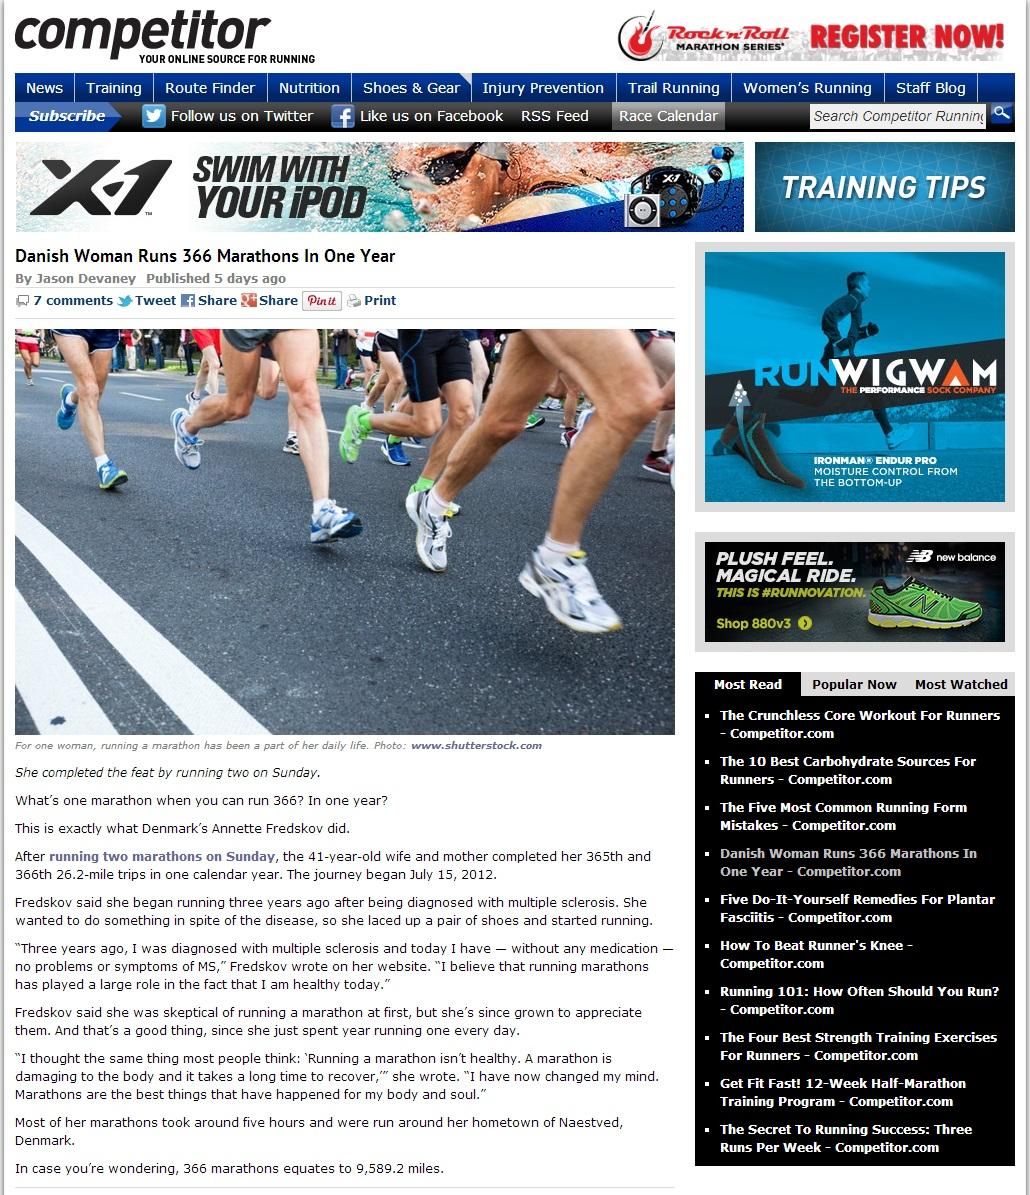 running.competitor.com 2013.07.16